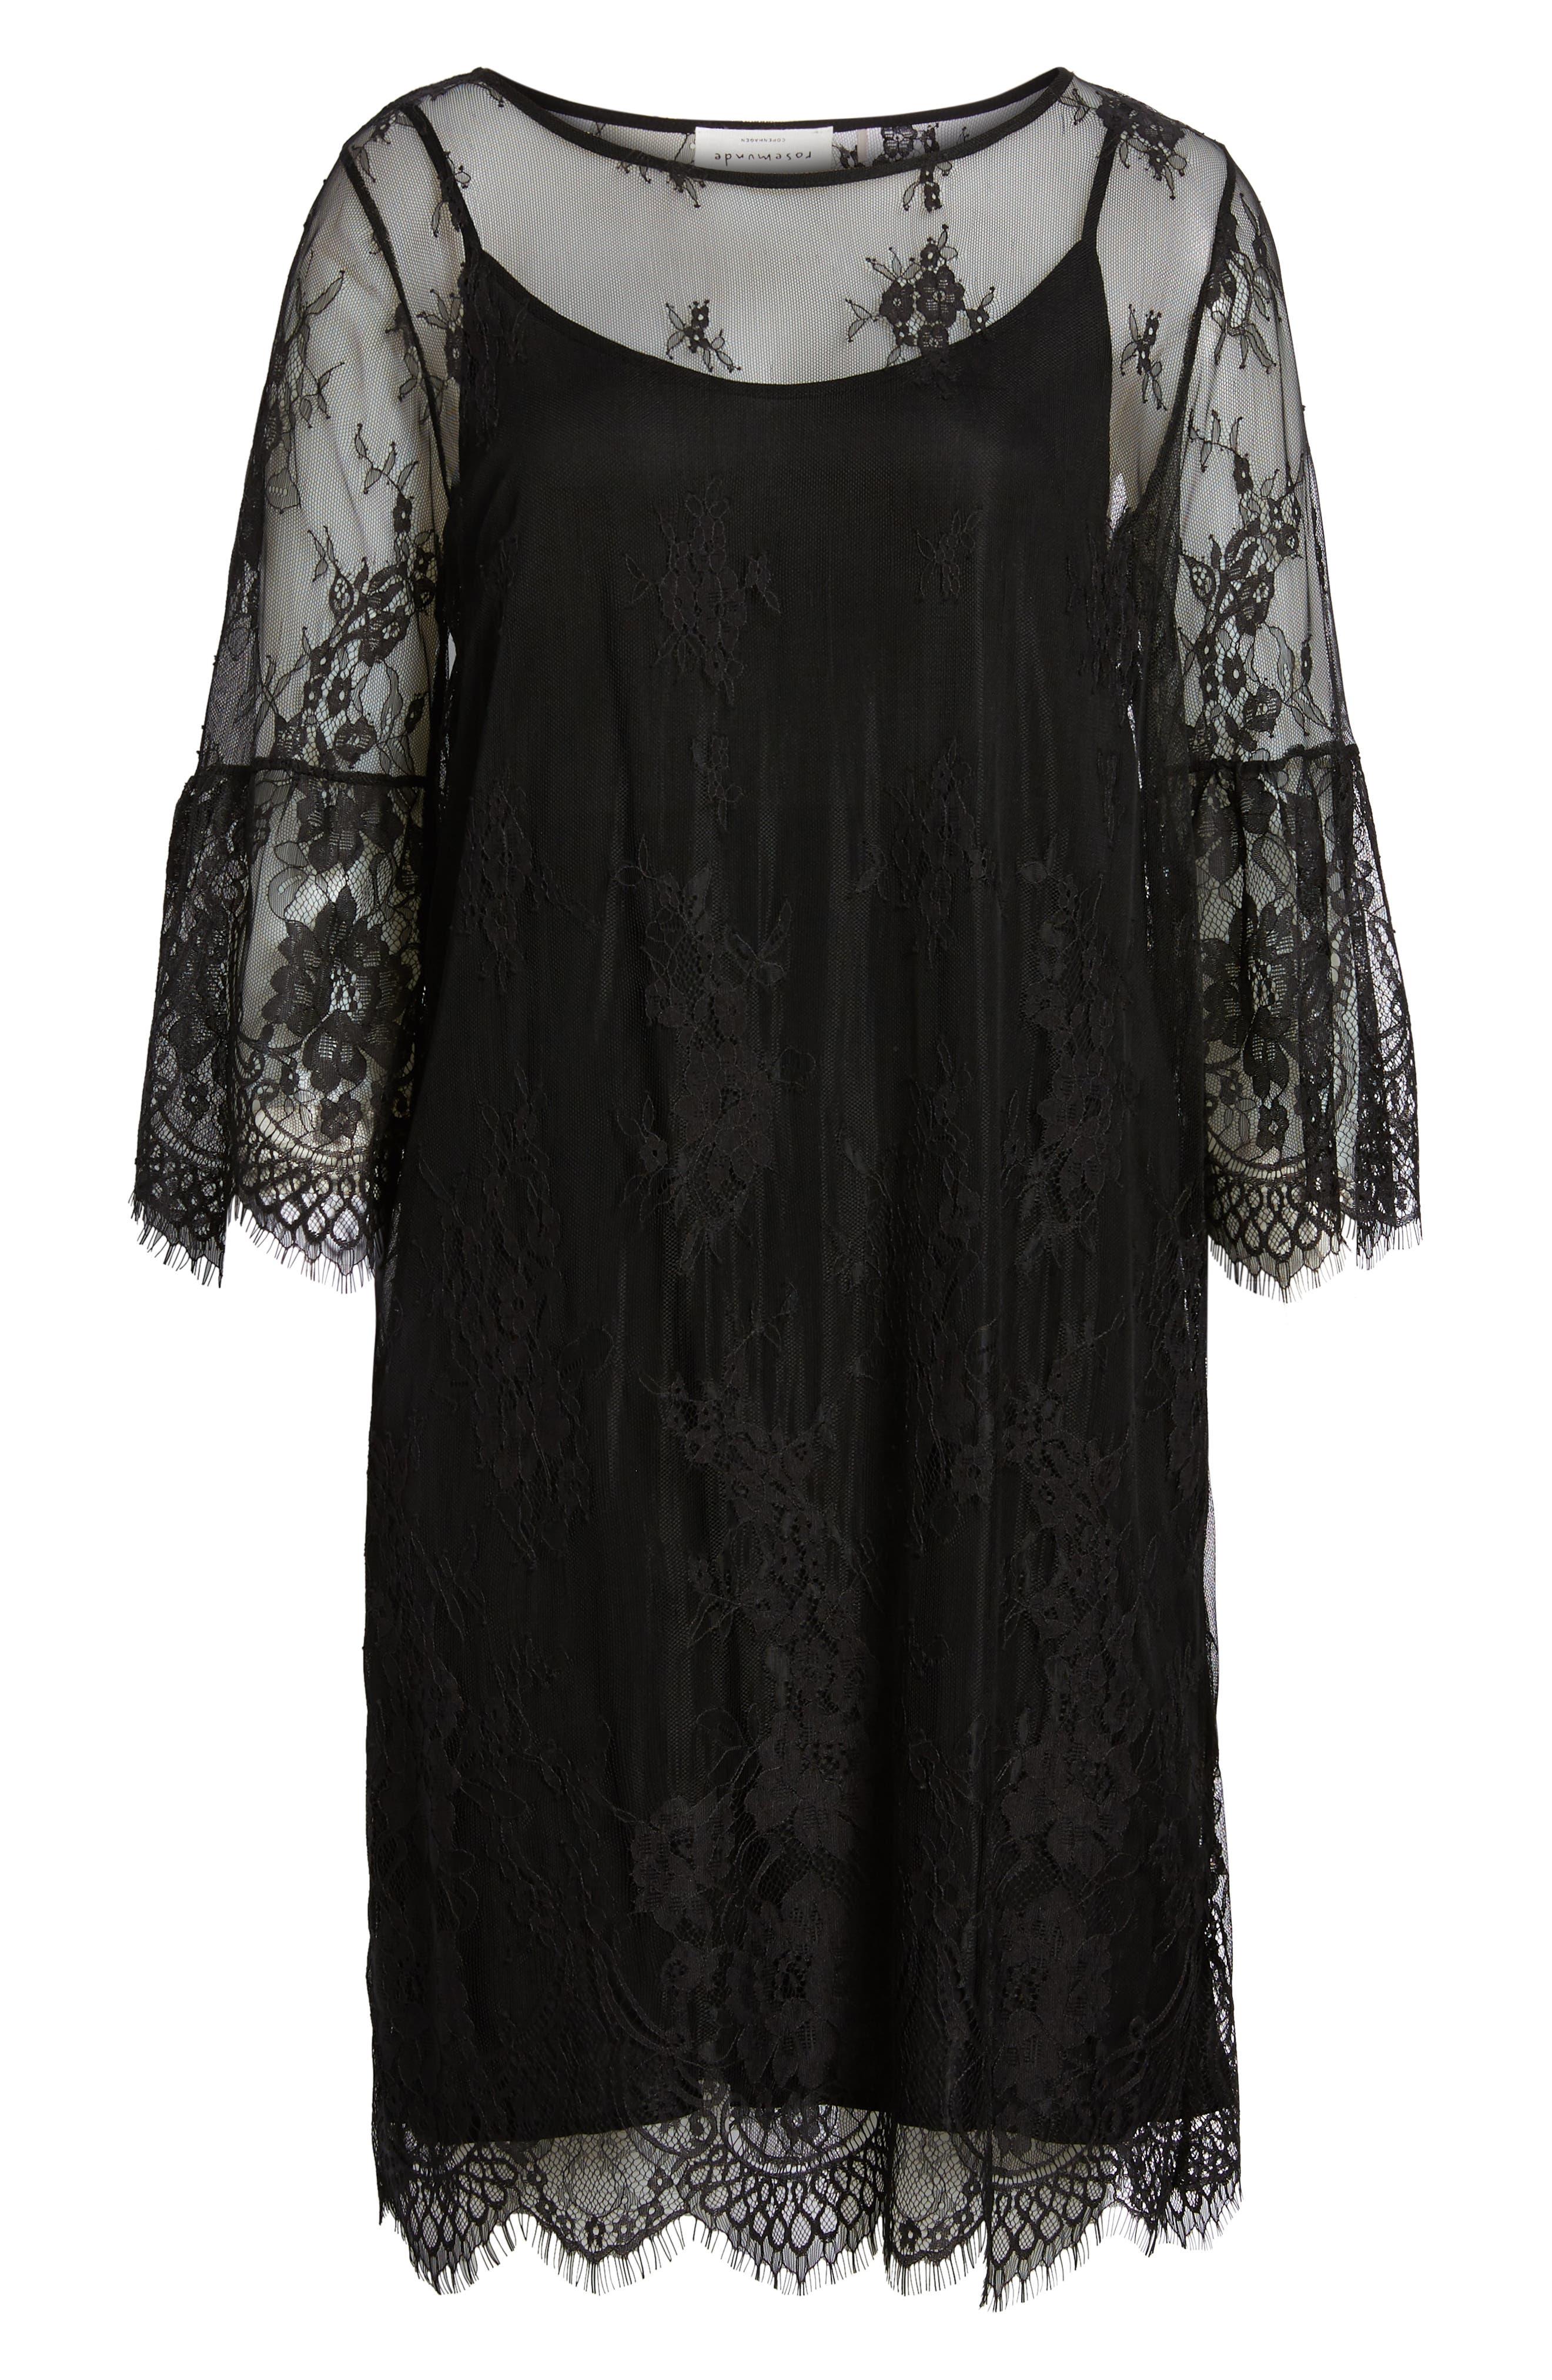 ROSEMUNDE, Aix Lace Dress, Alternate thumbnail 7, color, BLACK